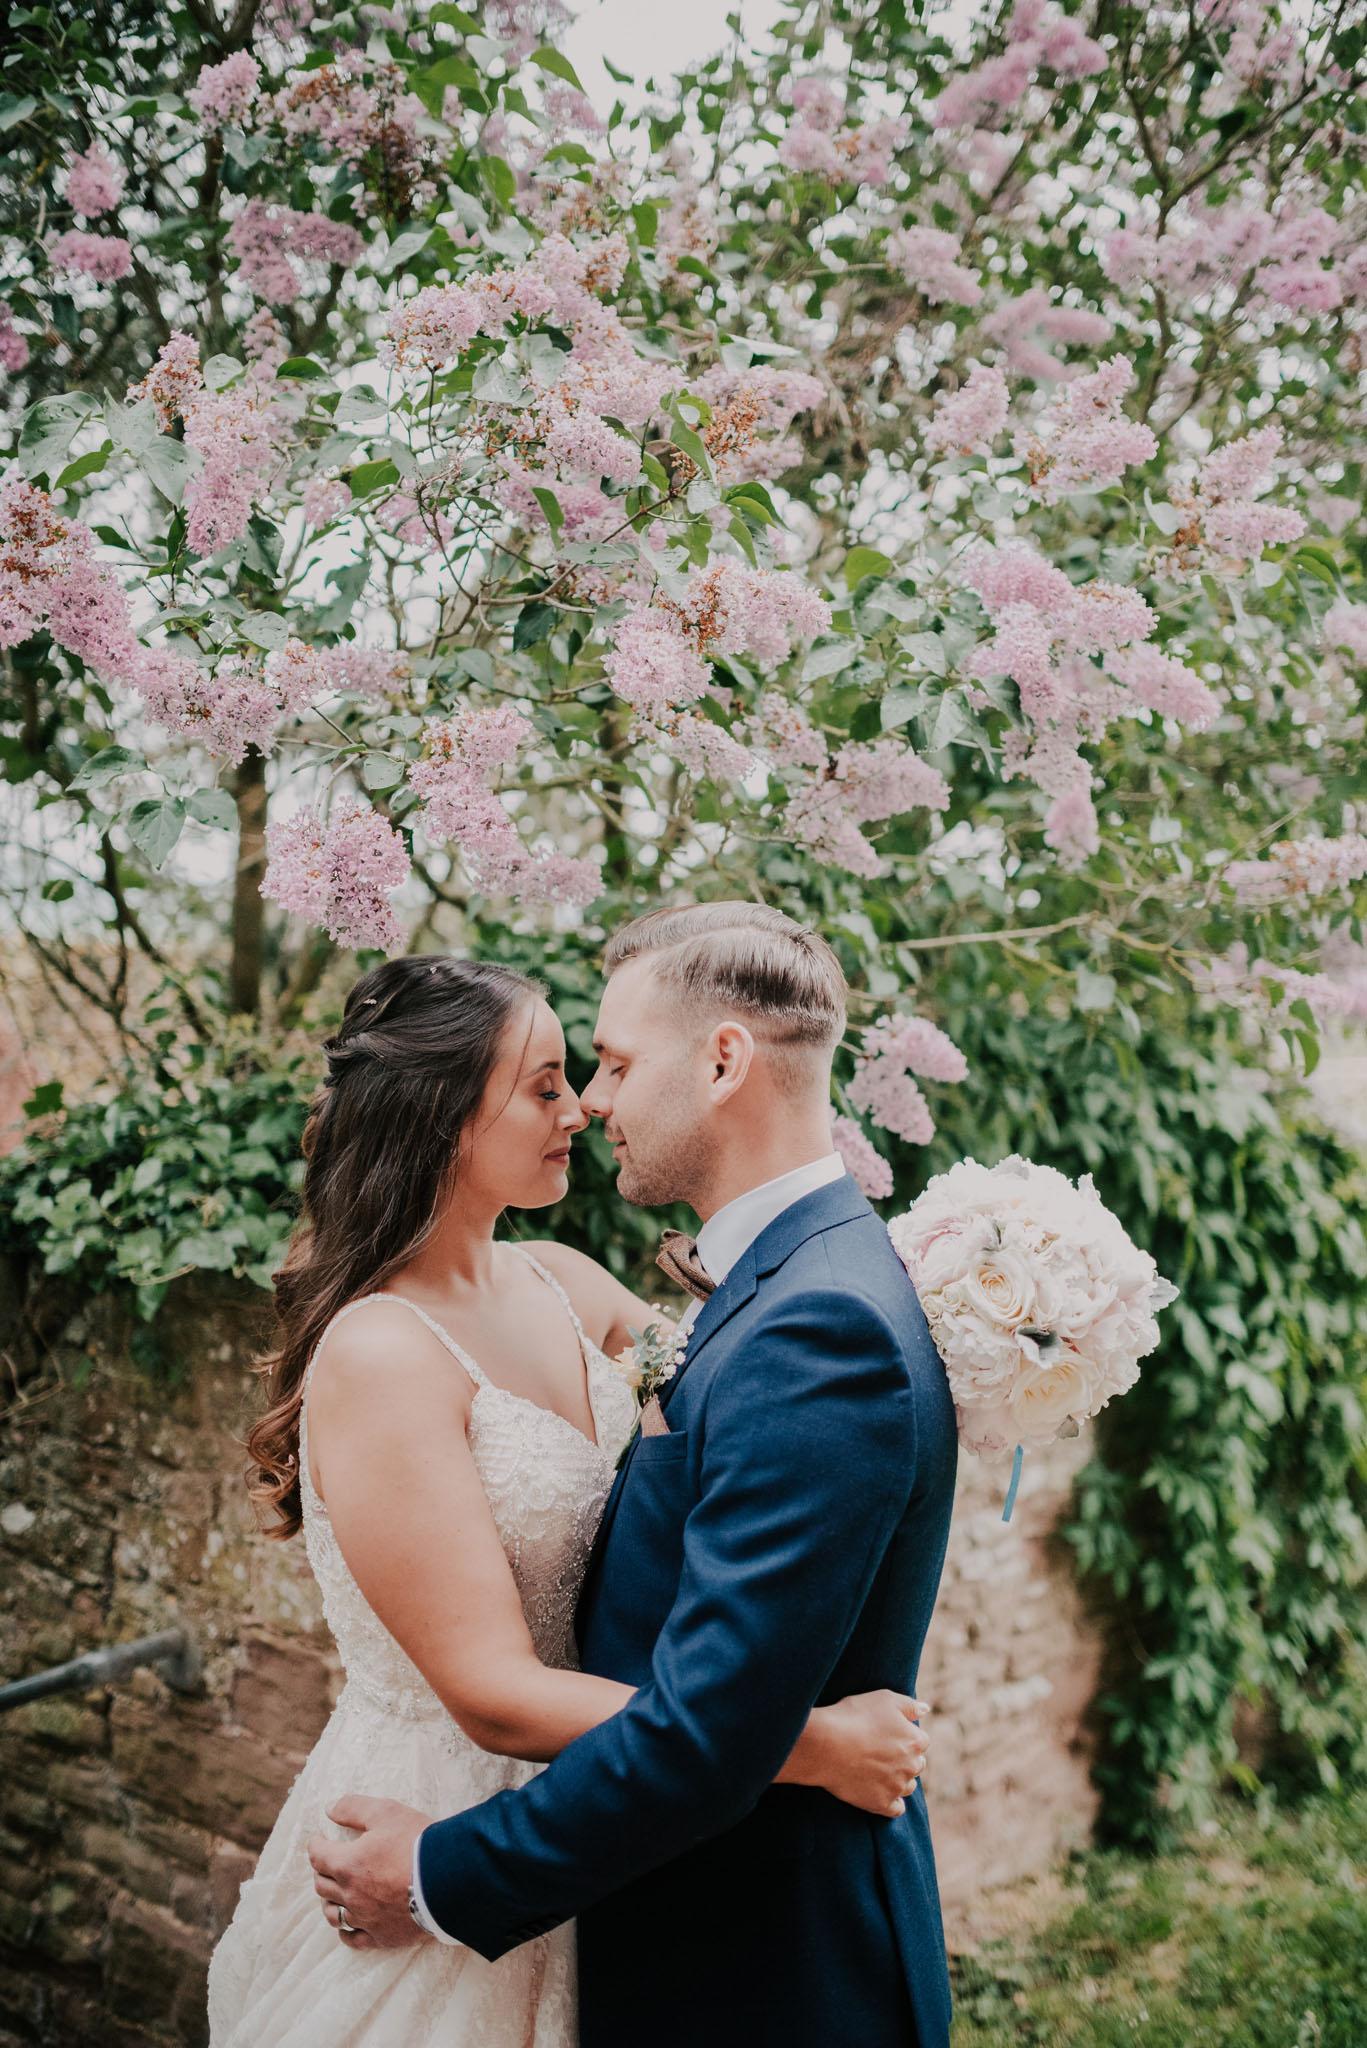 wedding-photographer-glewstone-court-hereford-scott-stockwell-photography302.jpg